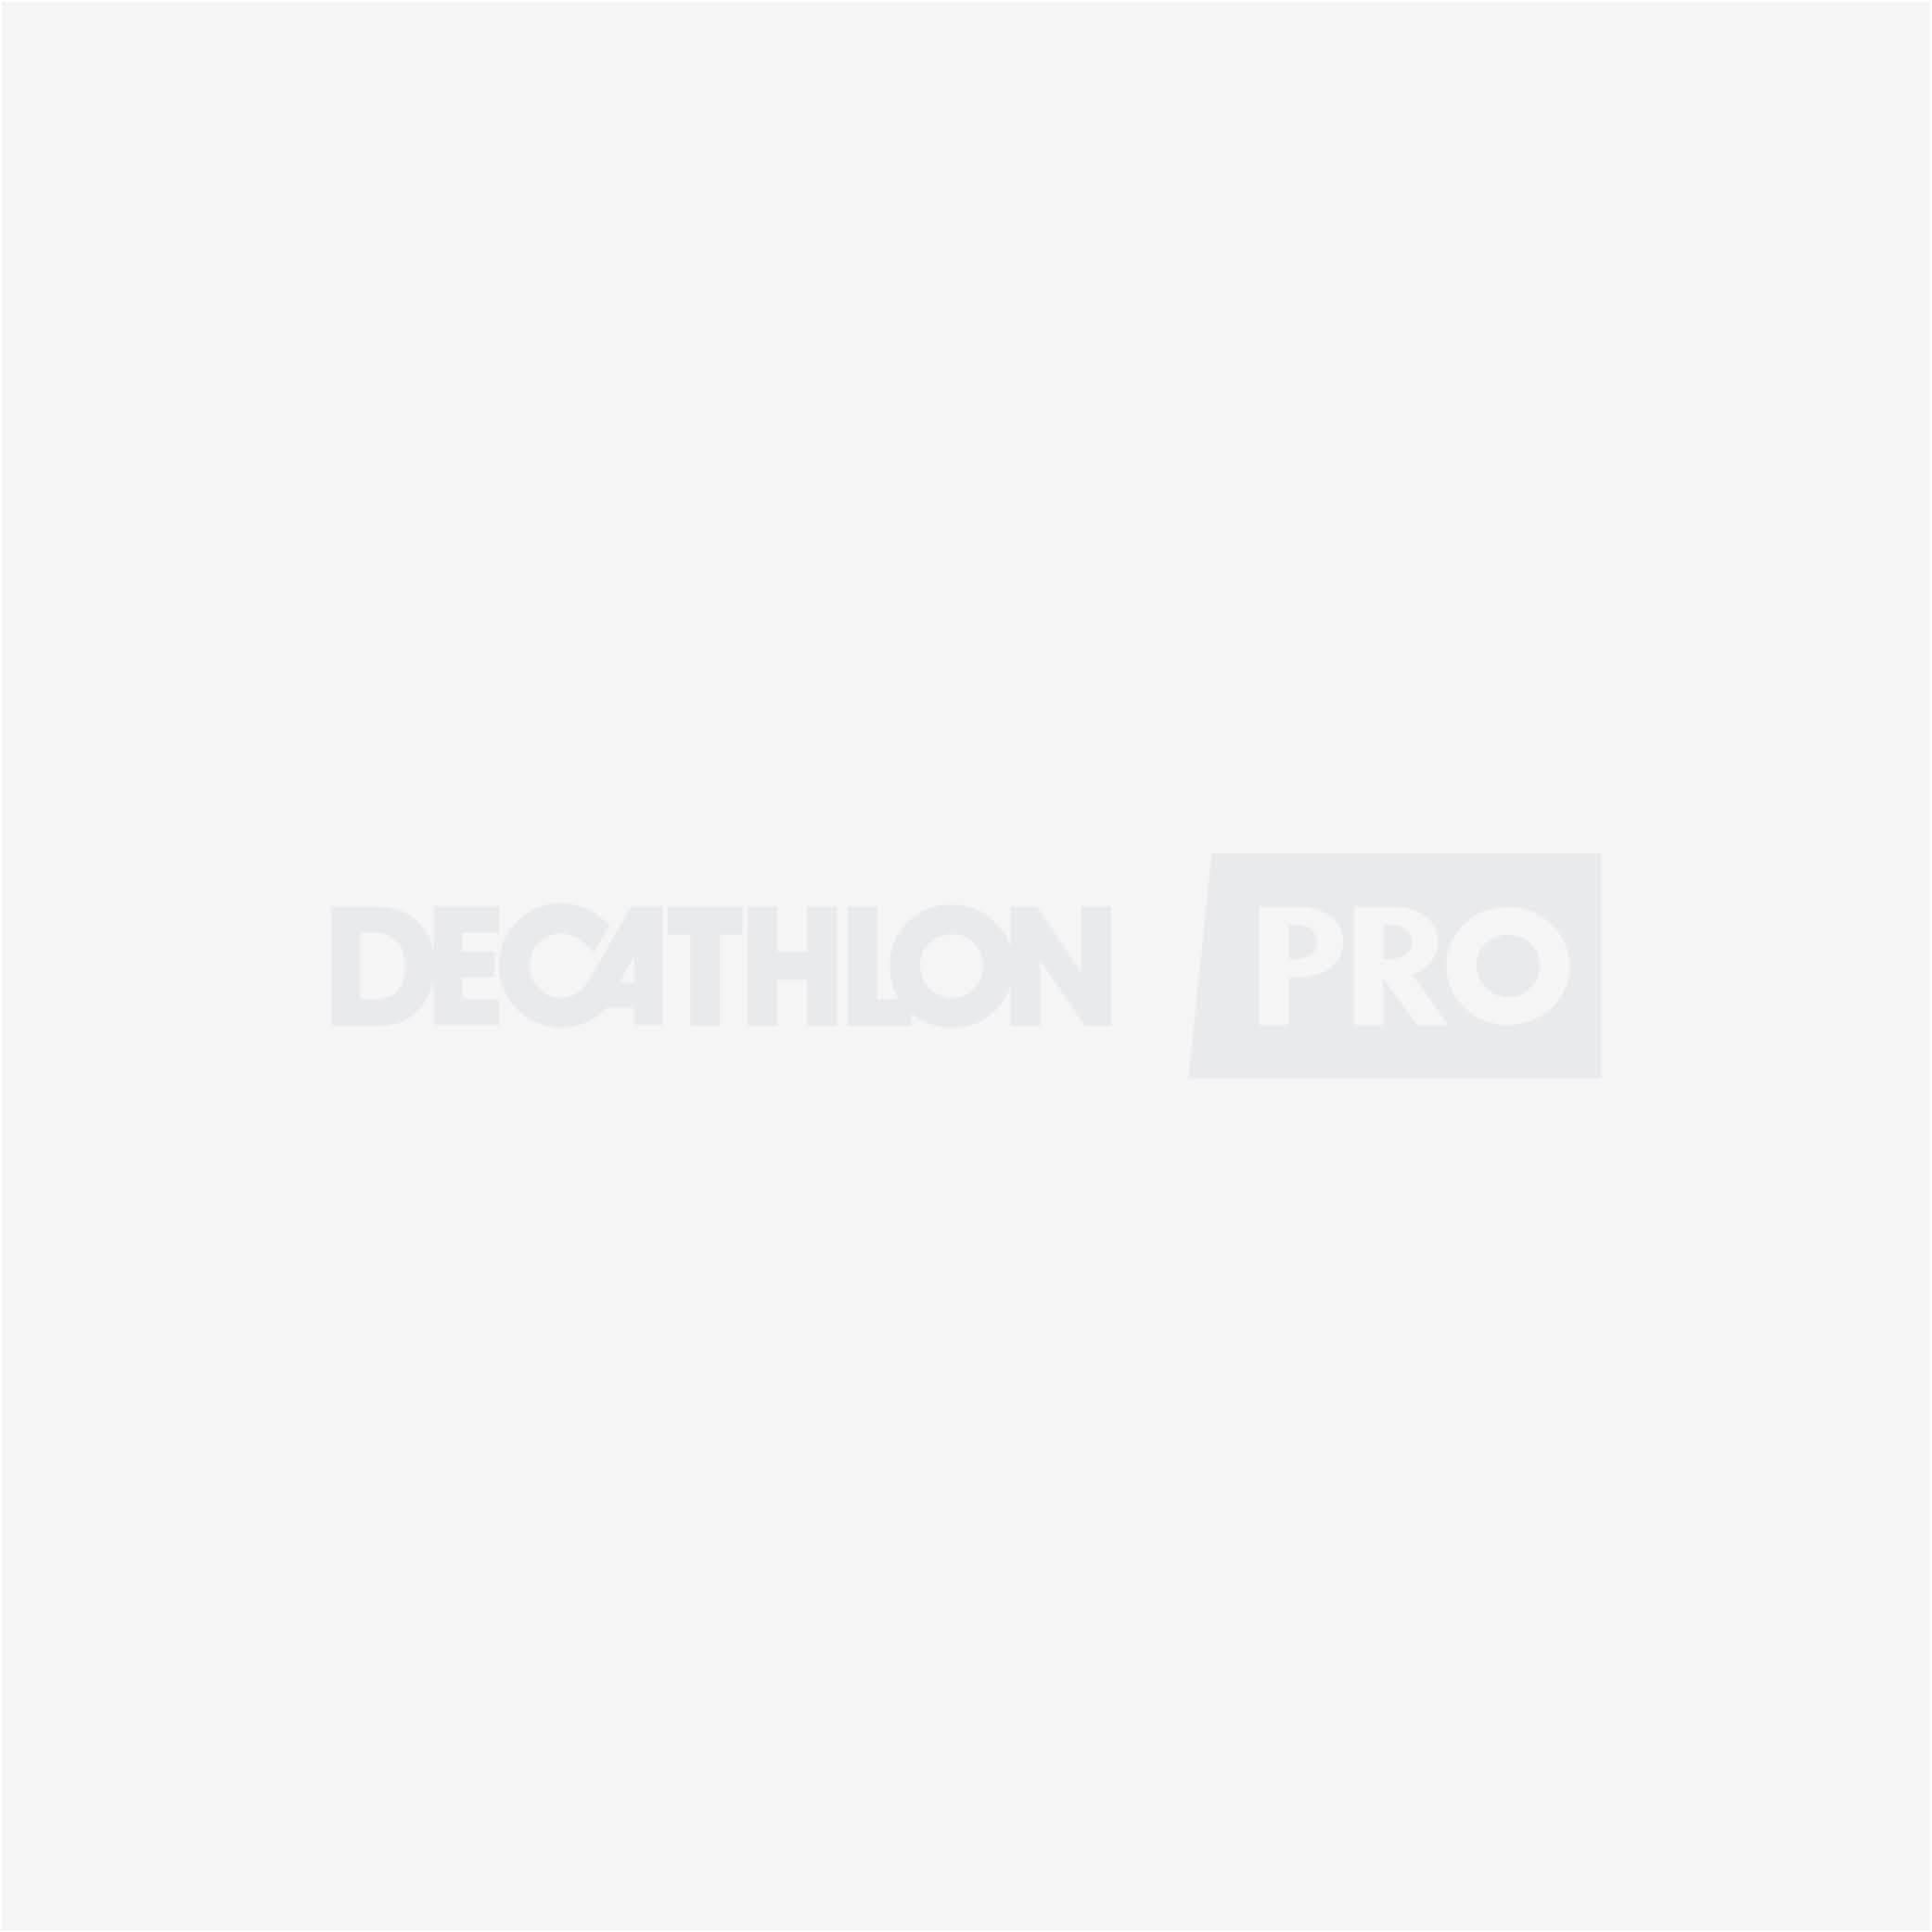 jeu noel 2015 Decathlon Pro